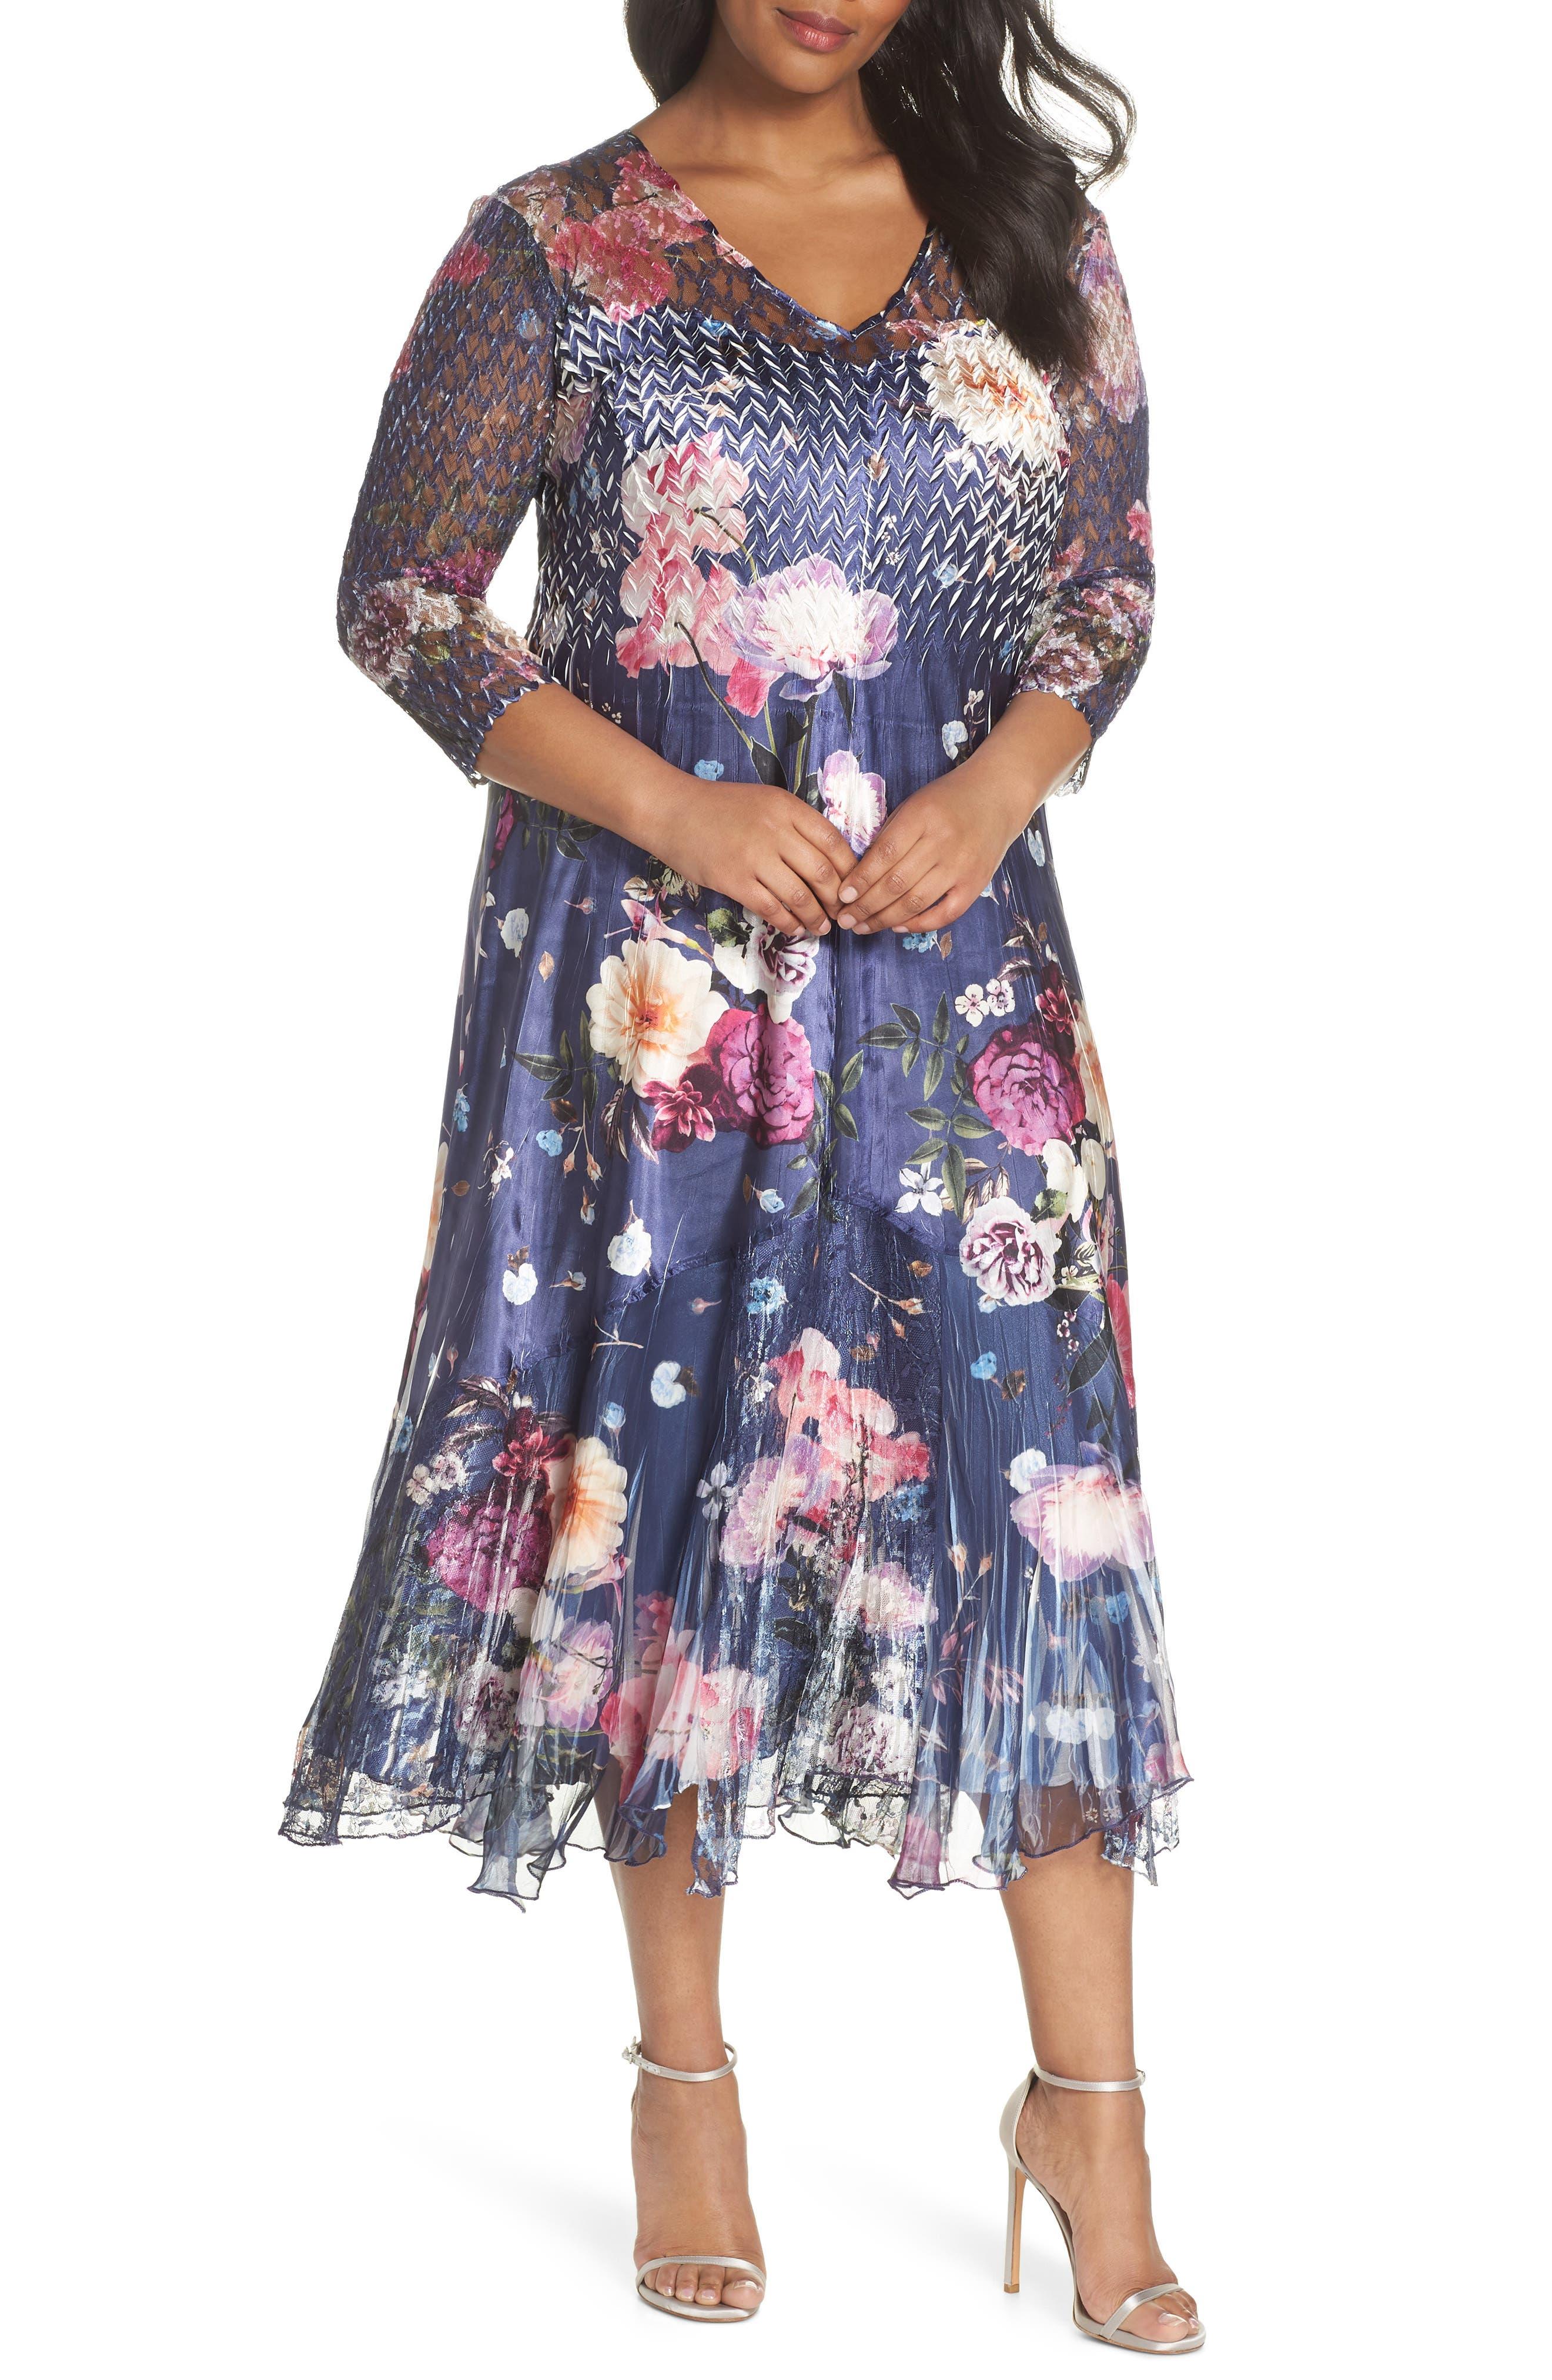 Koramov Floral Print Lace Inset Dress,                             Main thumbnail 1, color,                             500